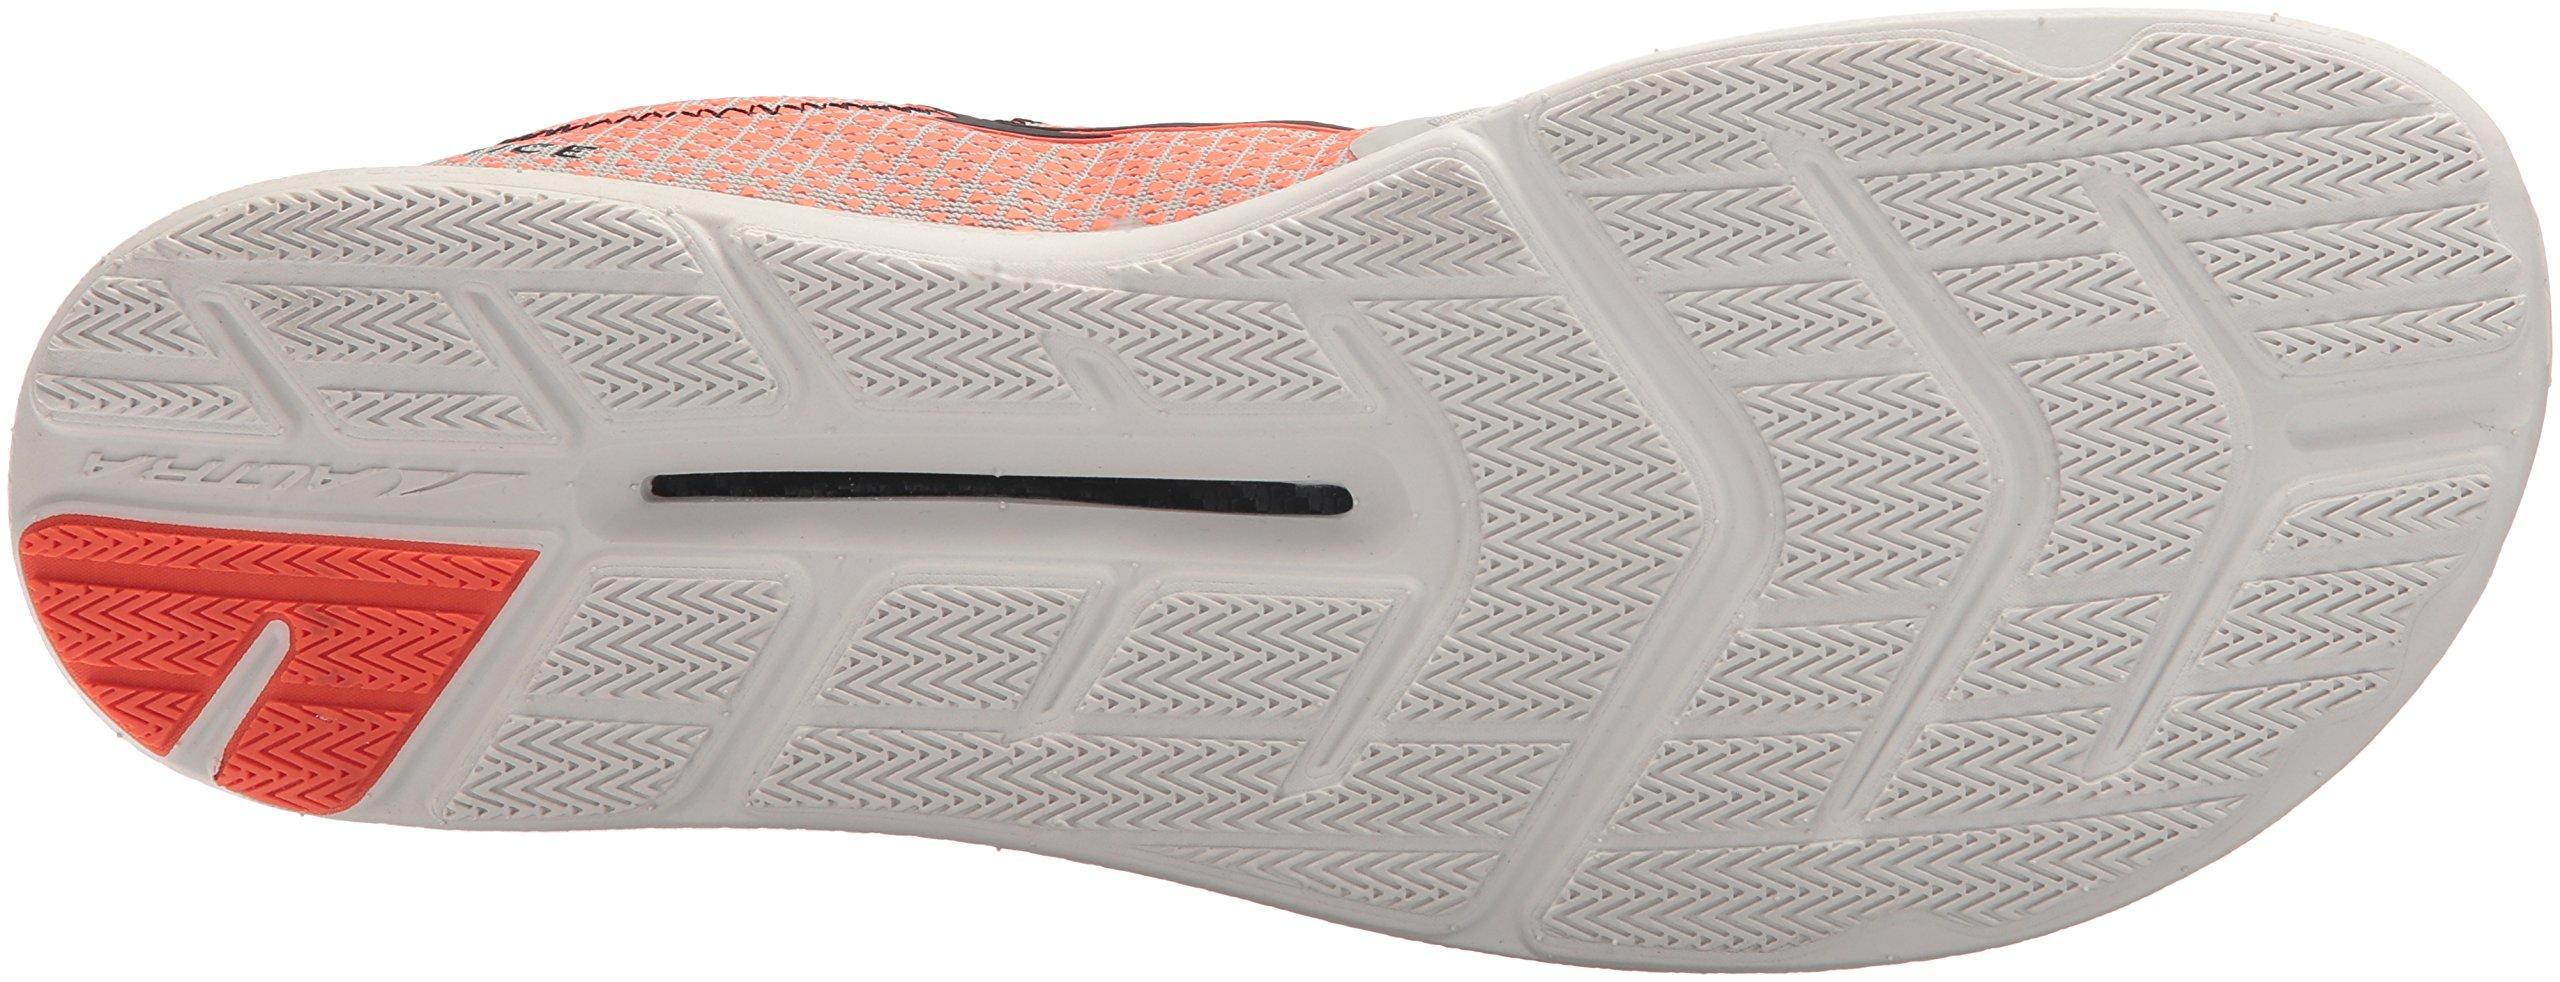 Altra Men's Solstice Sneaker, Orange, 7 Regular US by Altra (Image #3)